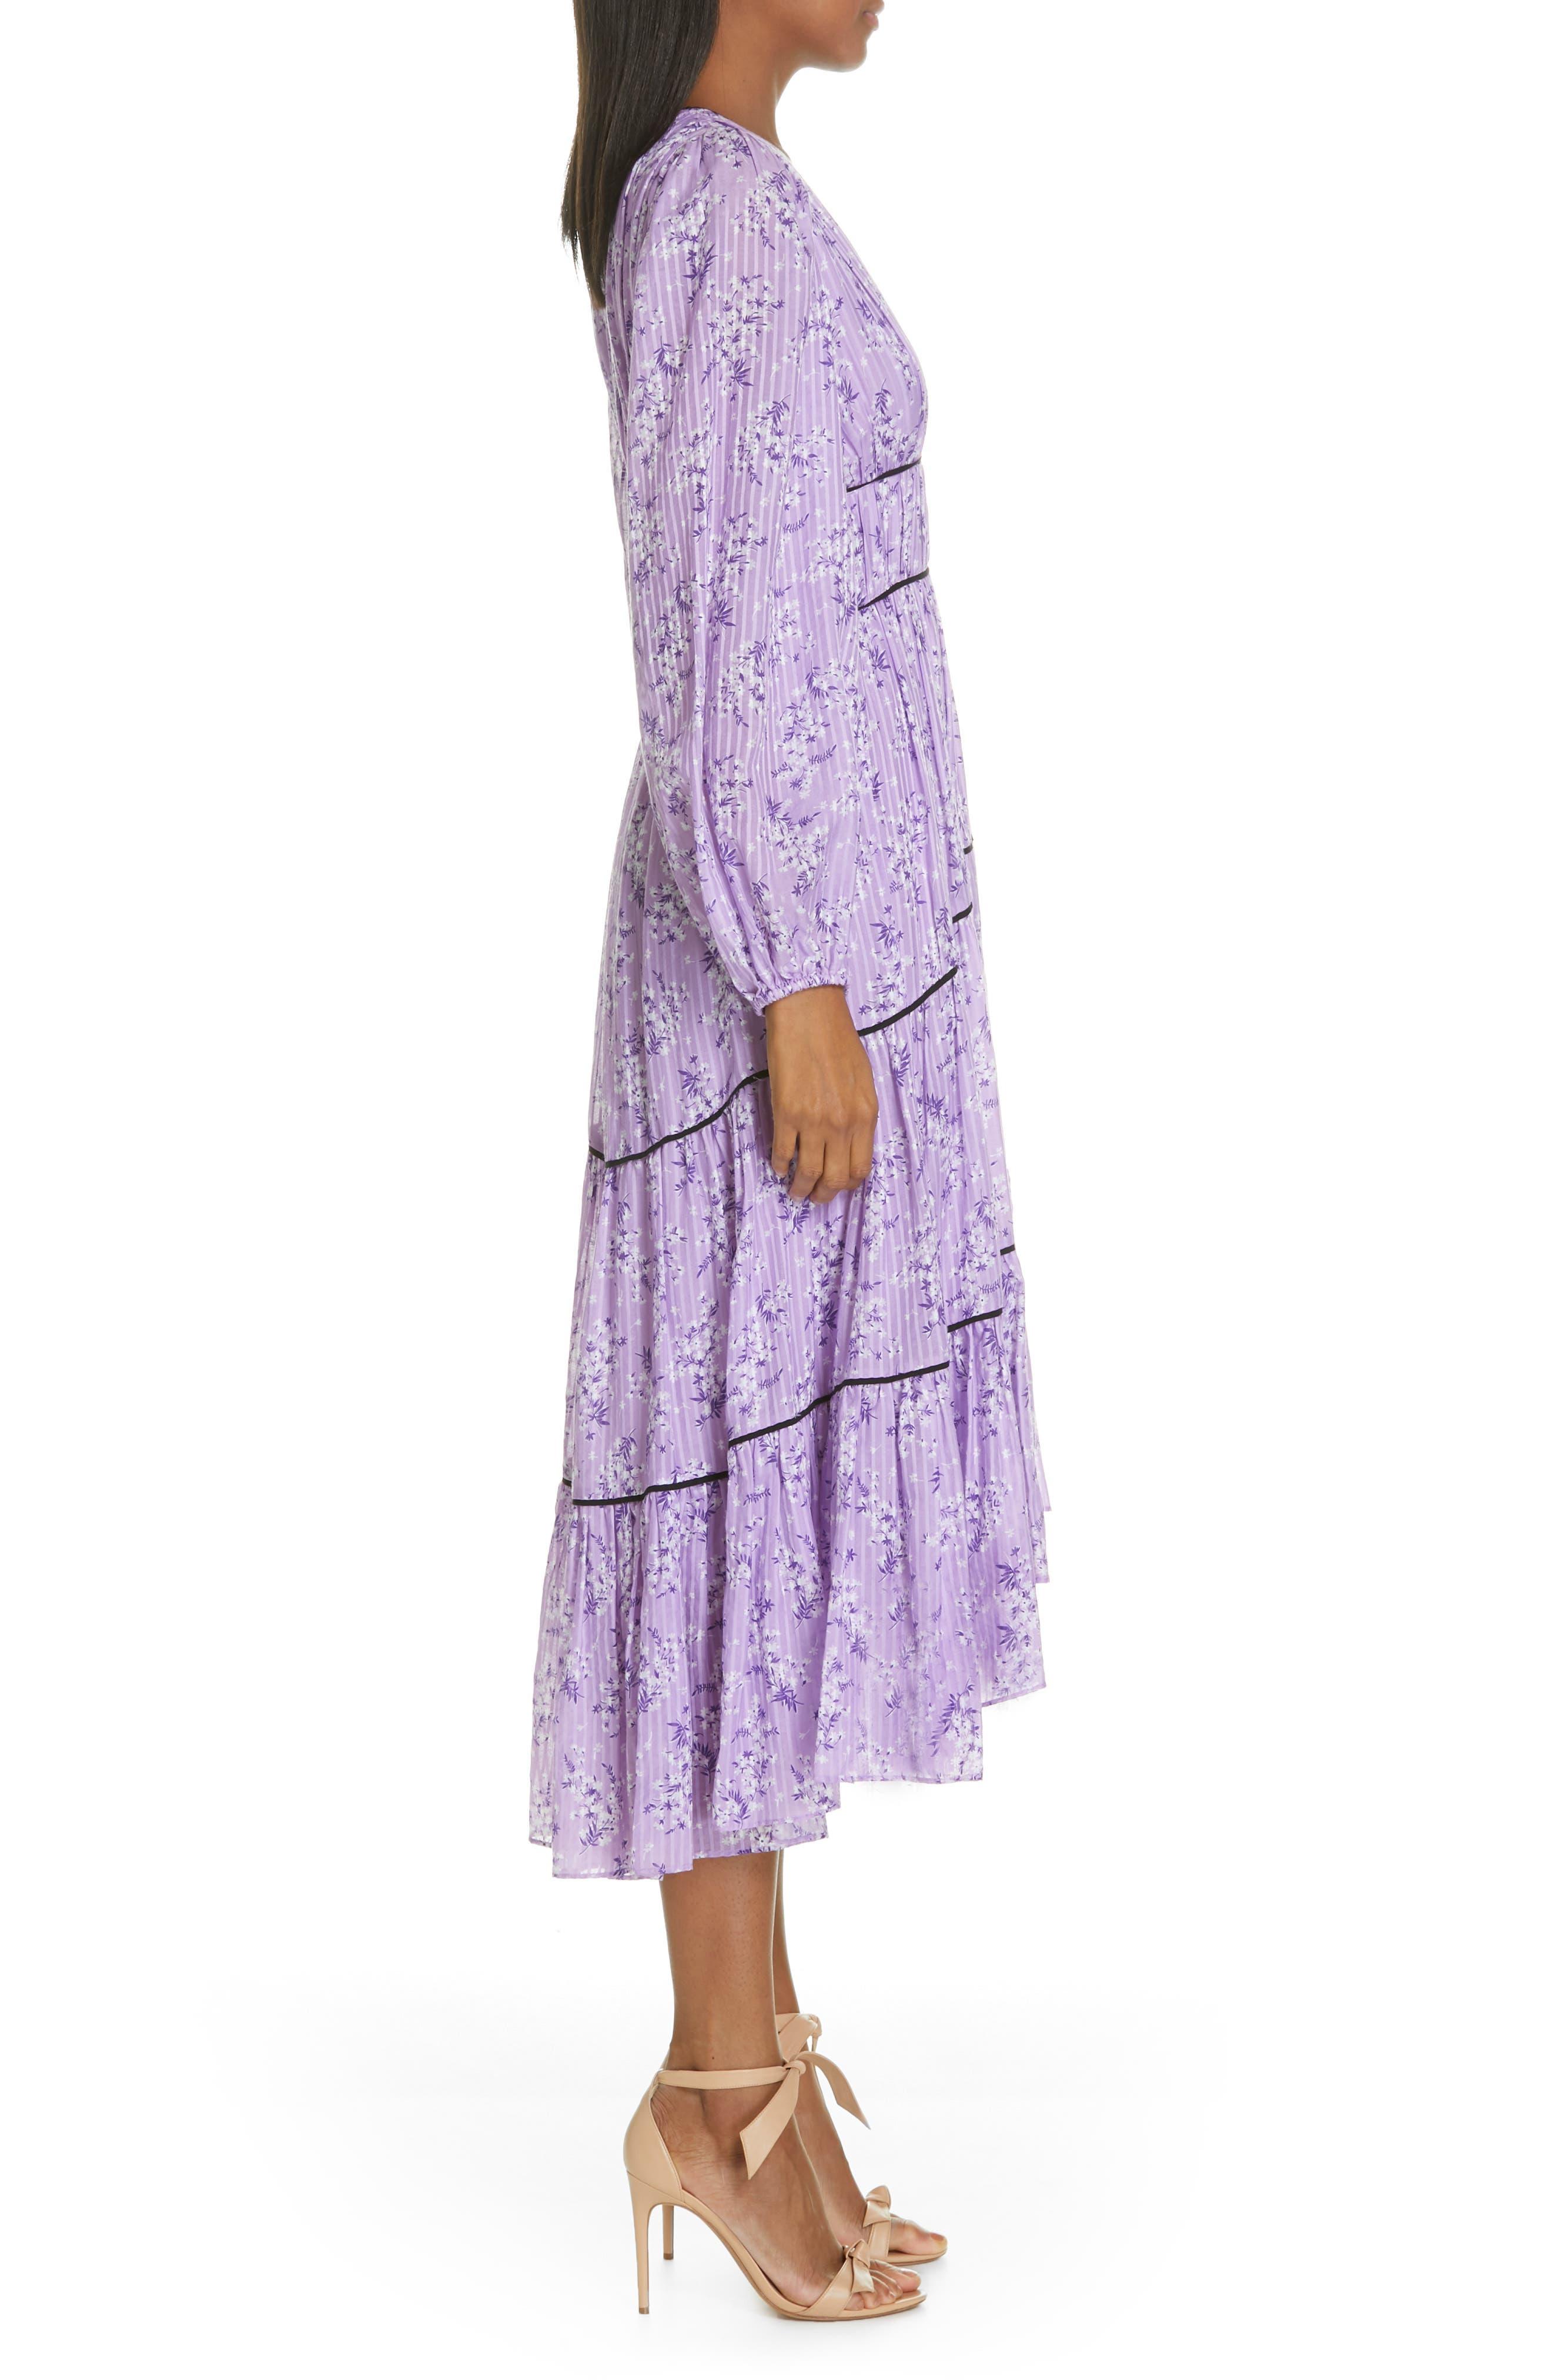 Joan Floral Print Cotton & Silk Midi Dress,                             Alternate thumbnail 3, color,                             LILAC